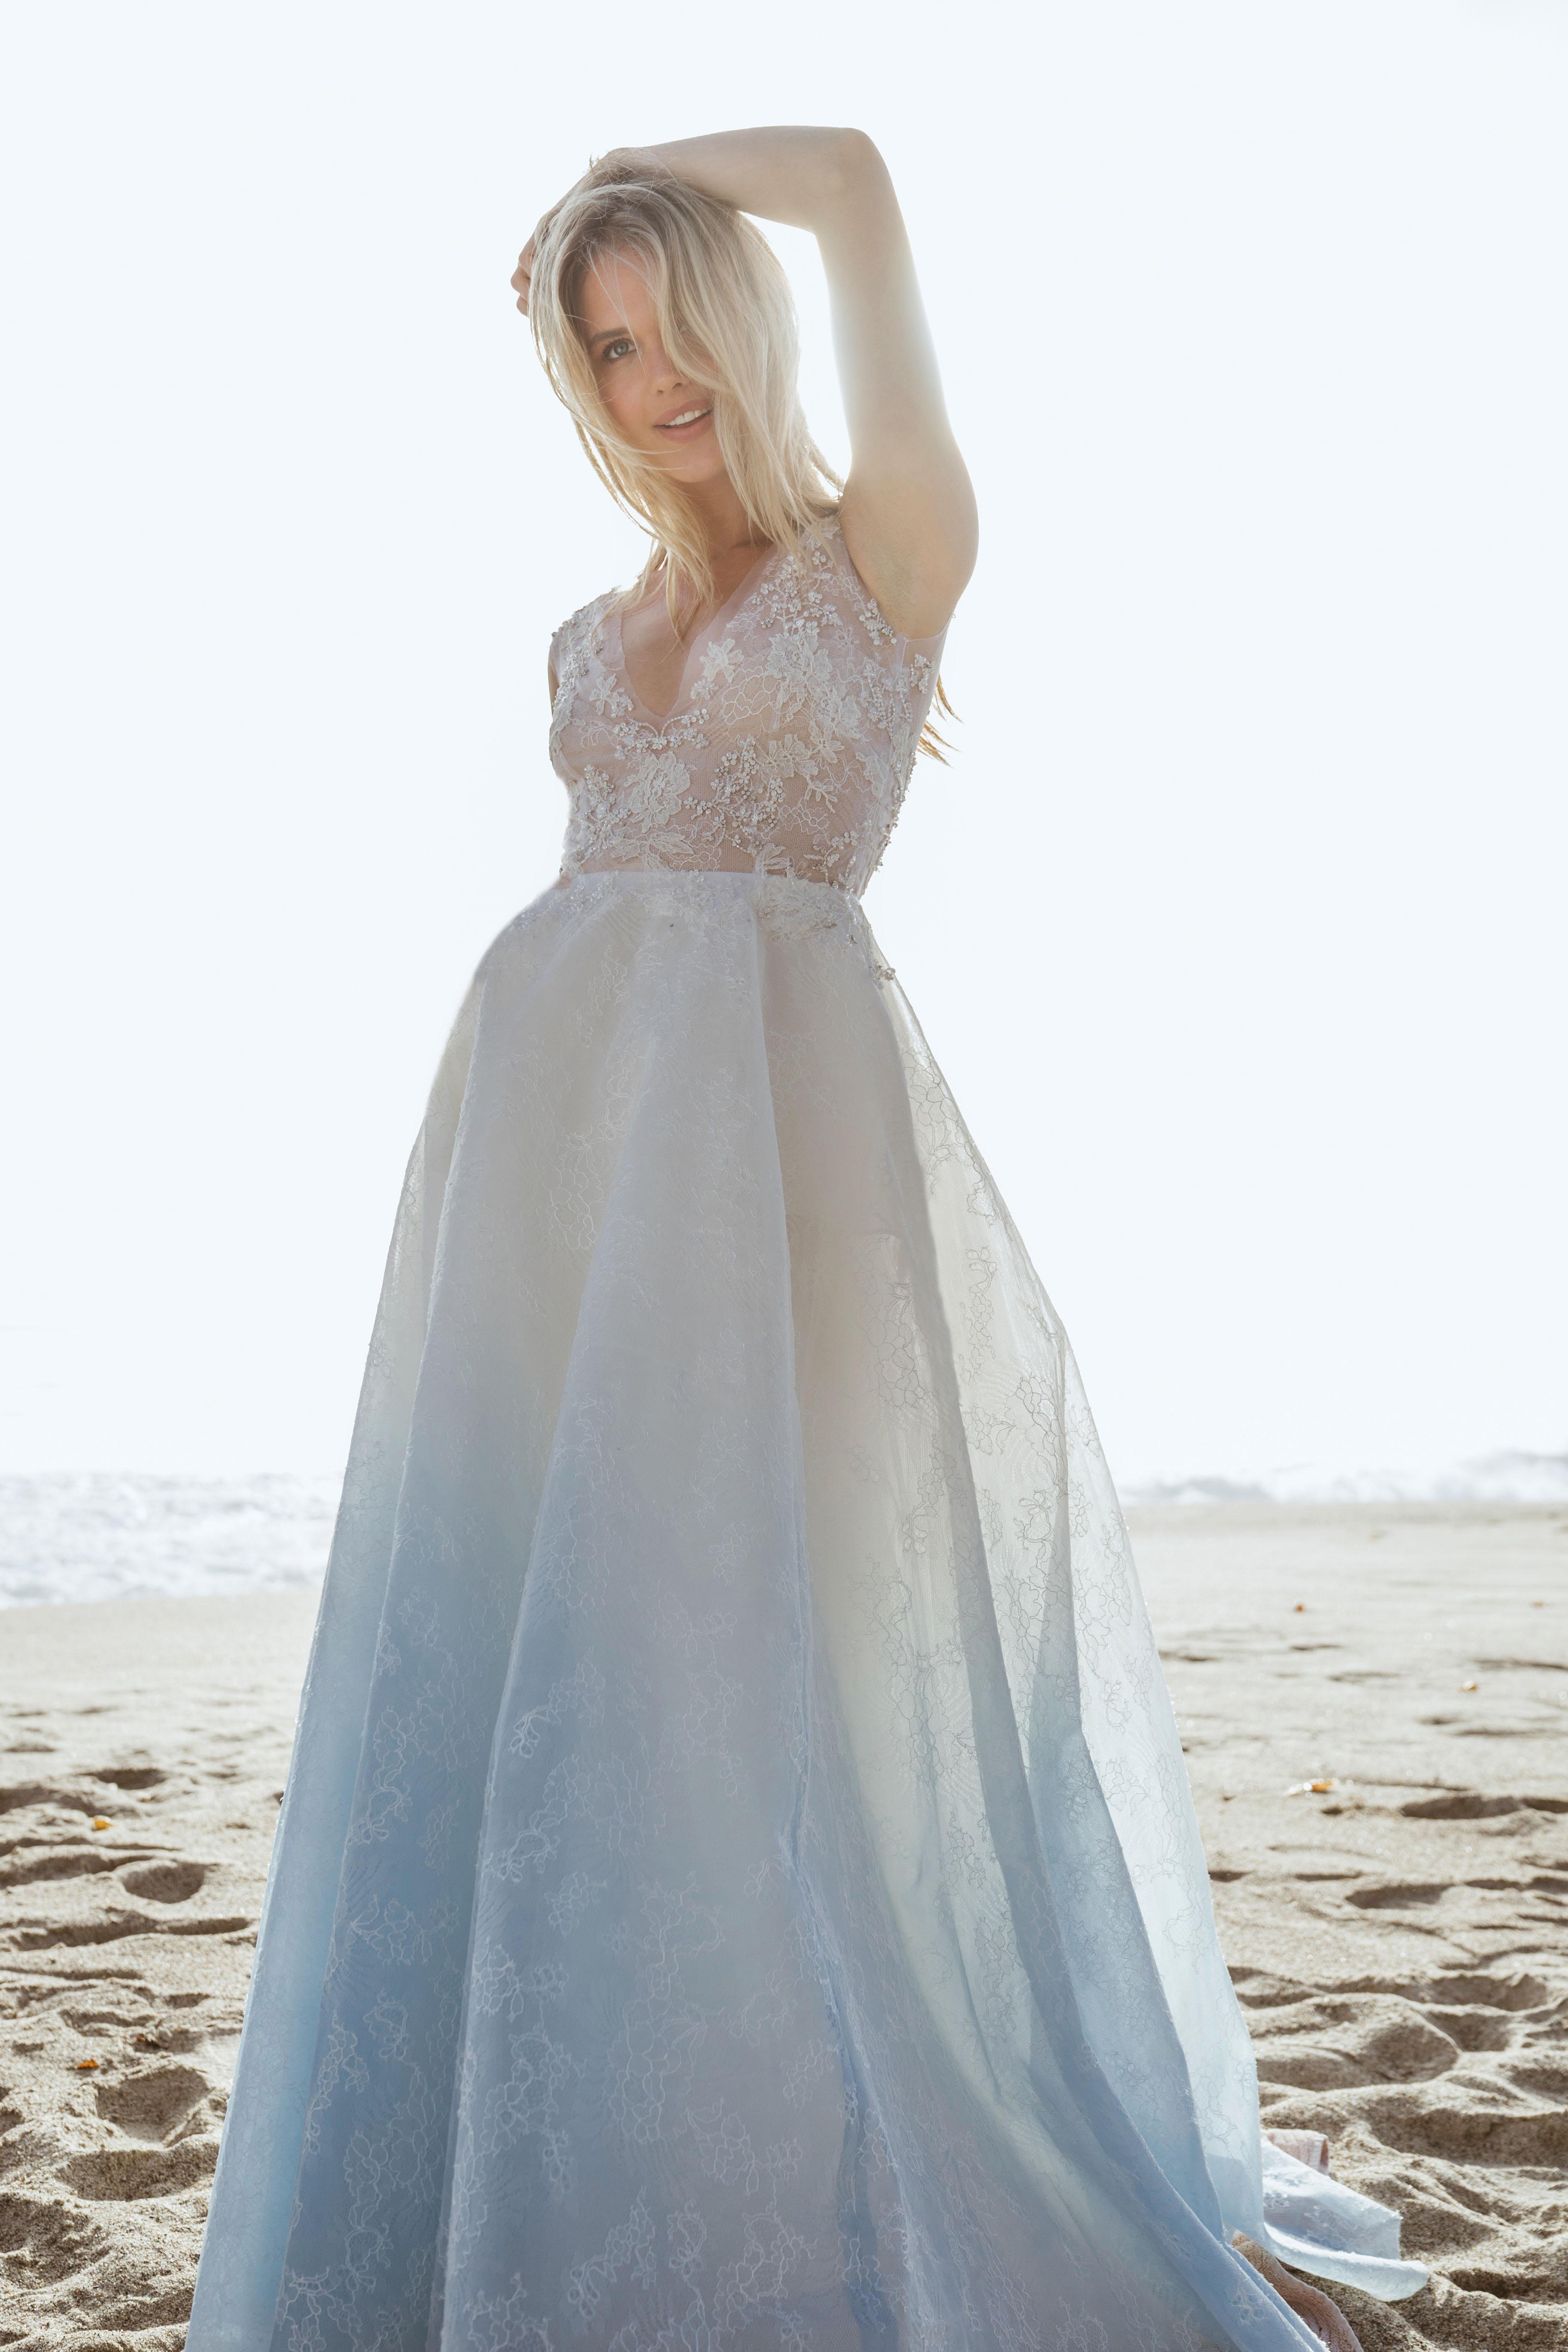 sabrina dahan lace v-neck ball gown wedding dress spring 2018